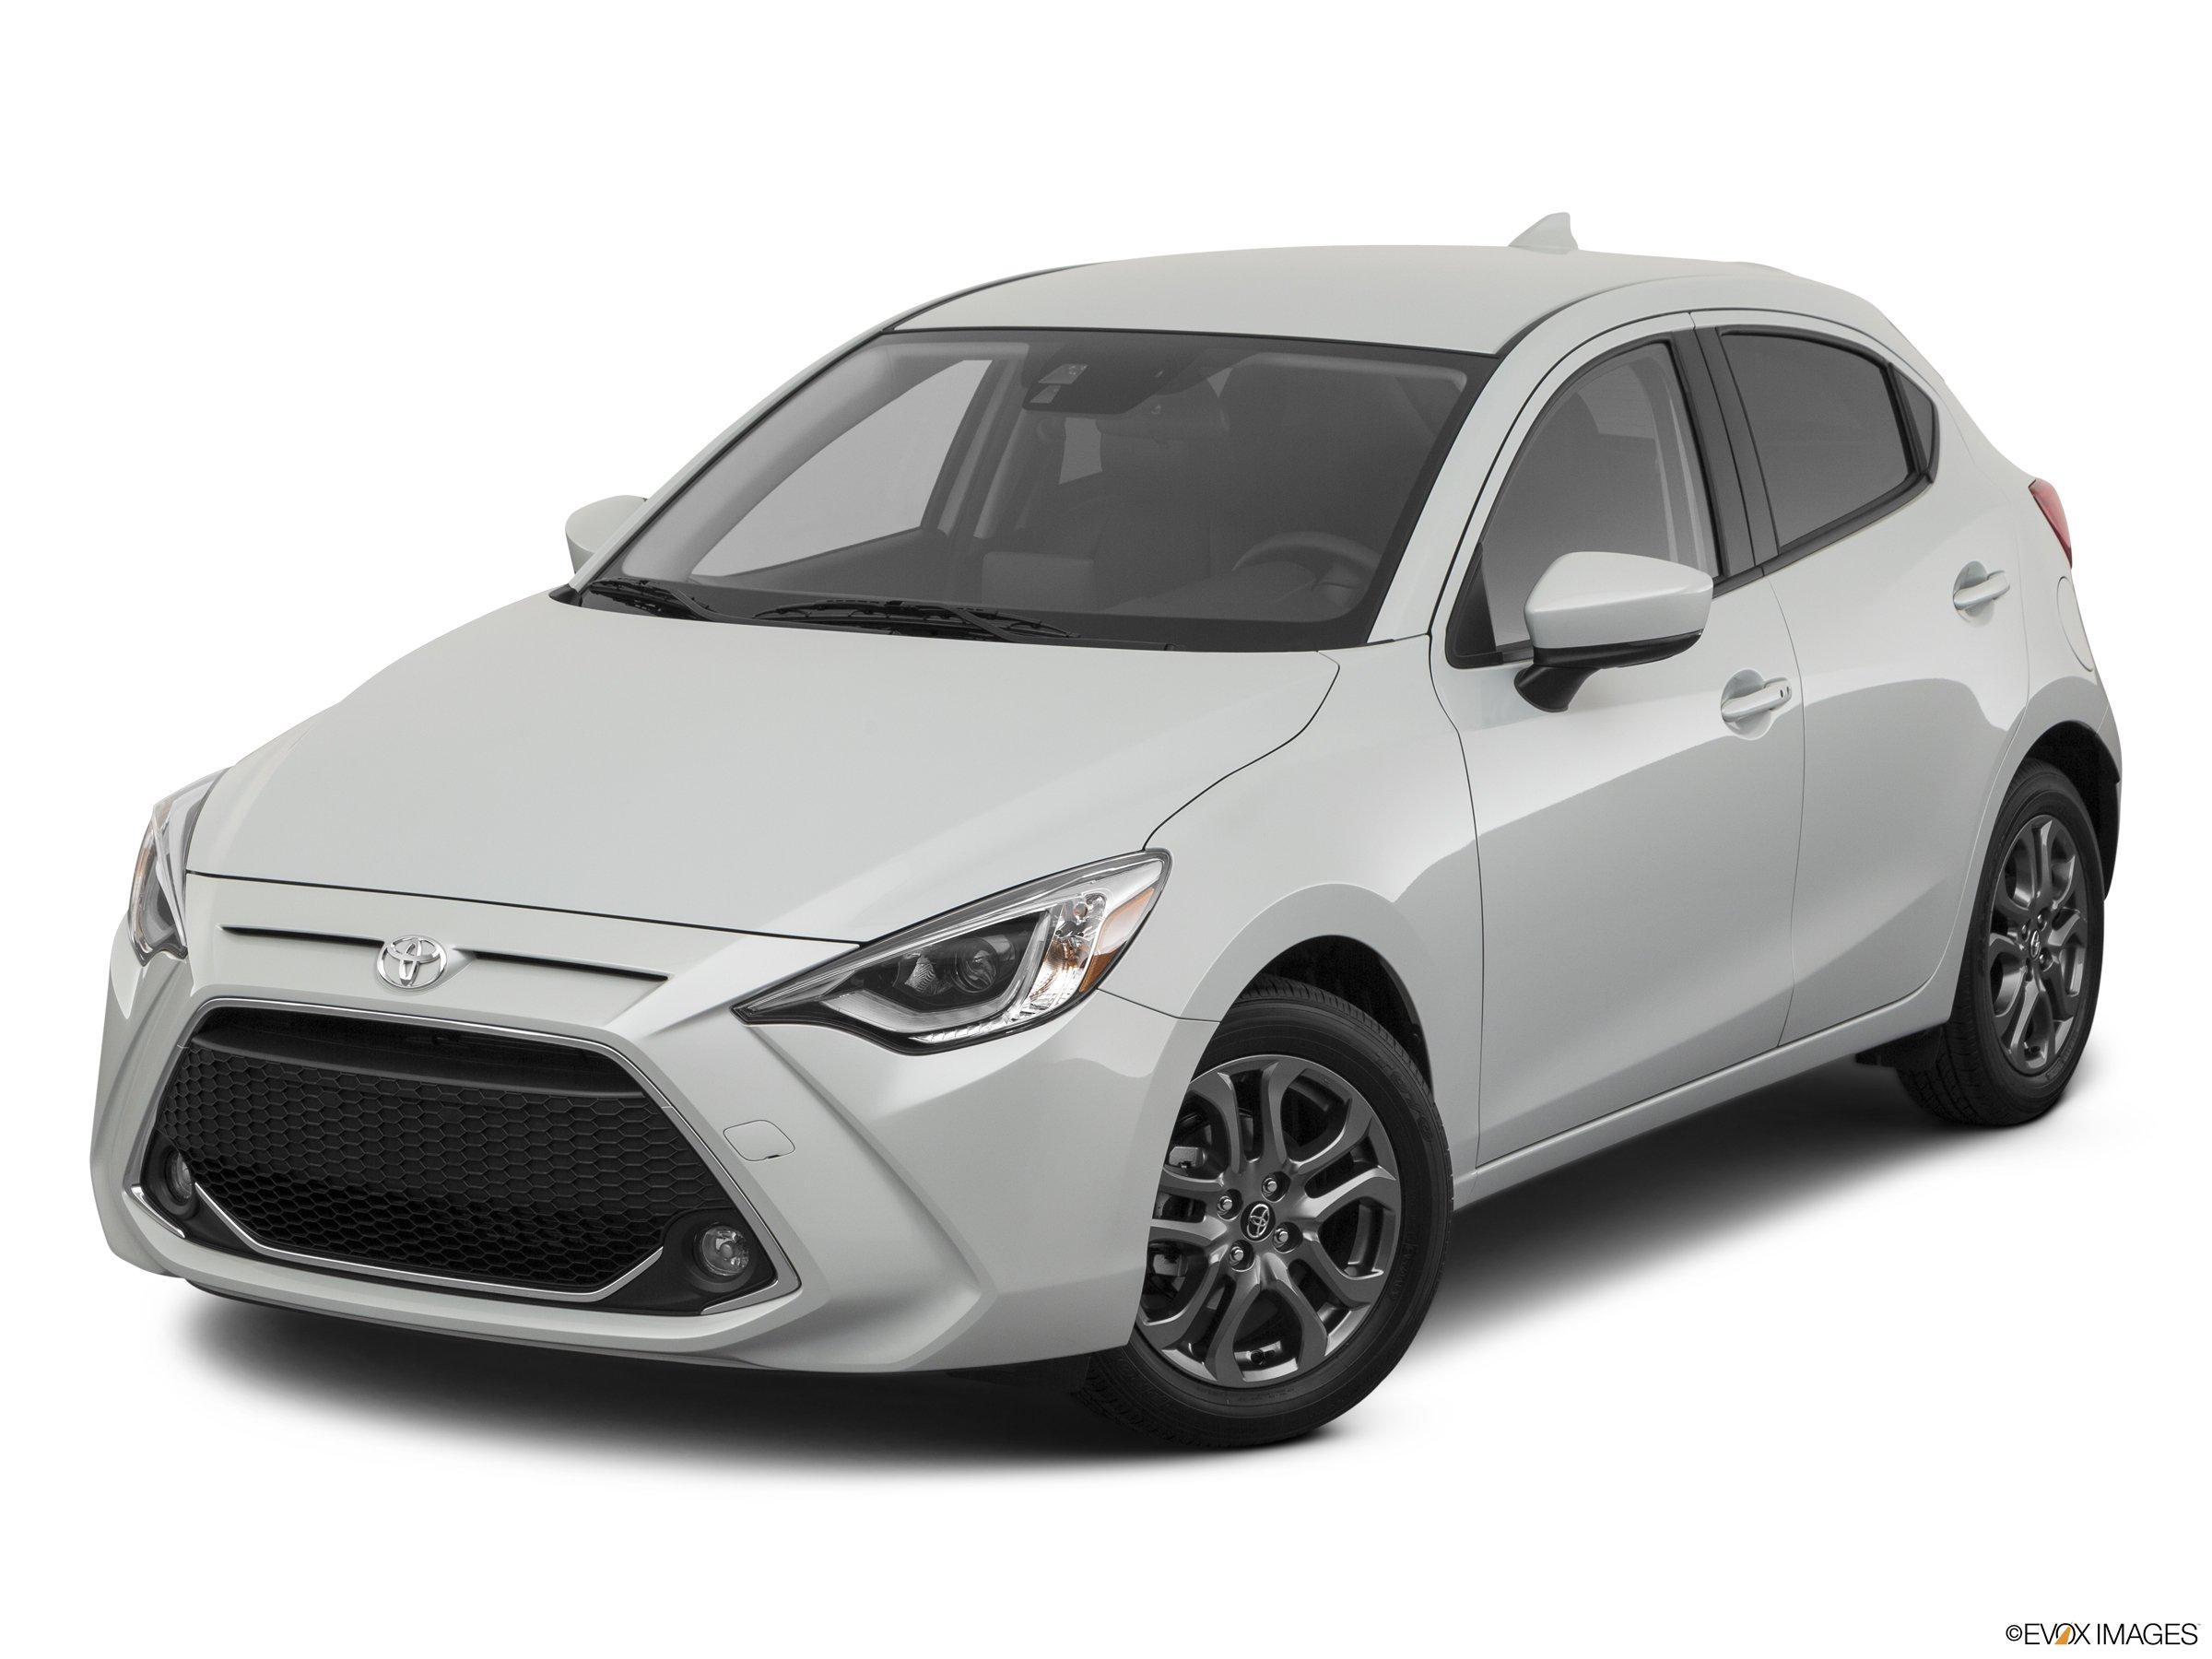 2020 Toyota Yaris XLE FWD hatchback